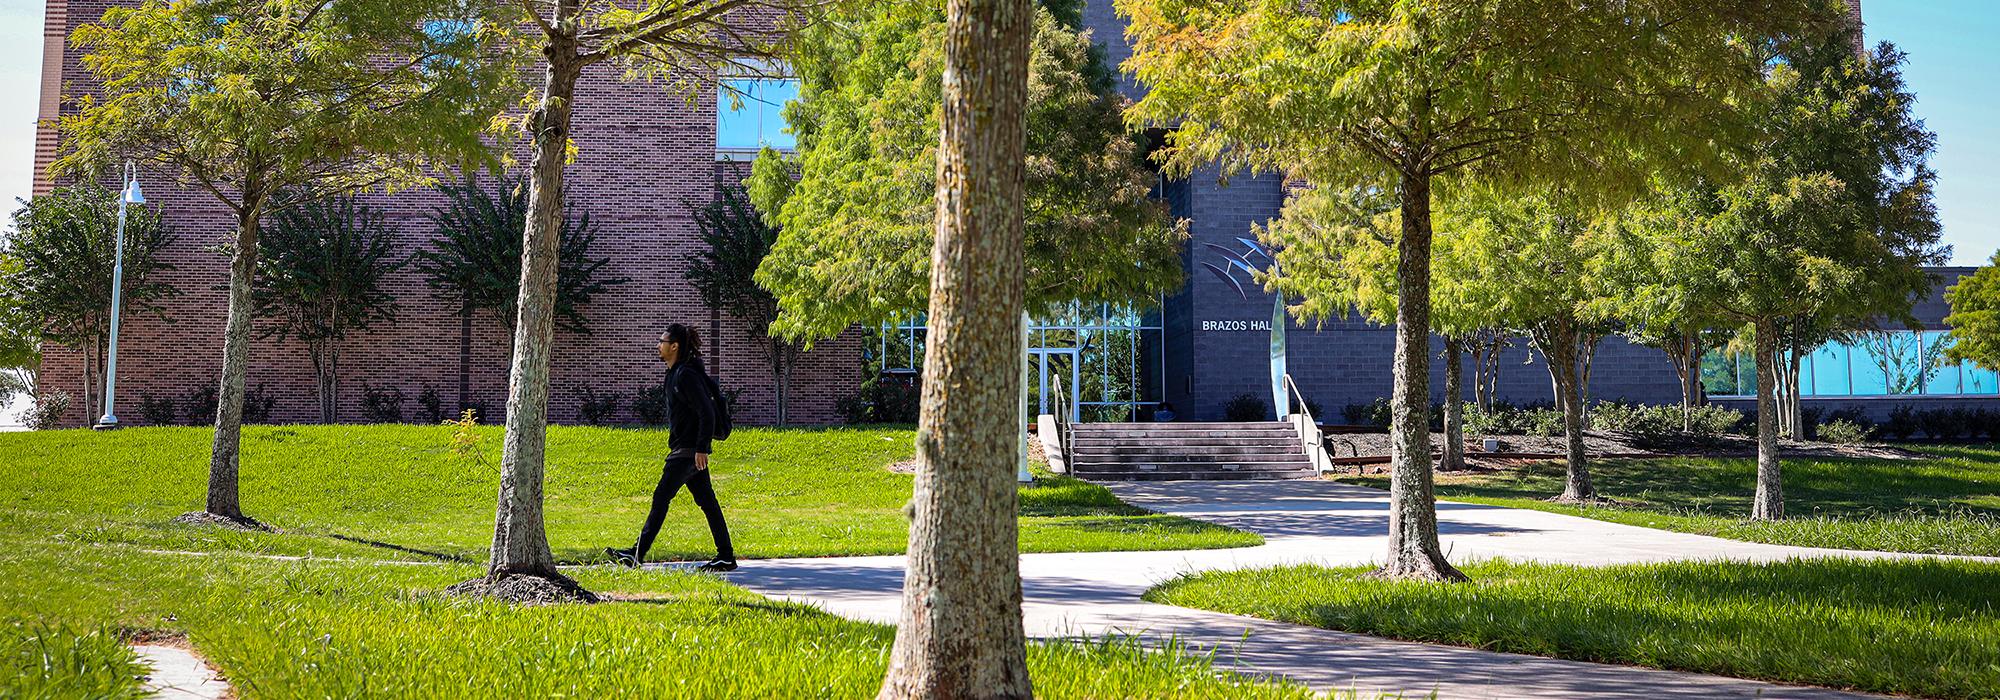 Brazos Hall UH Sugar Land campus